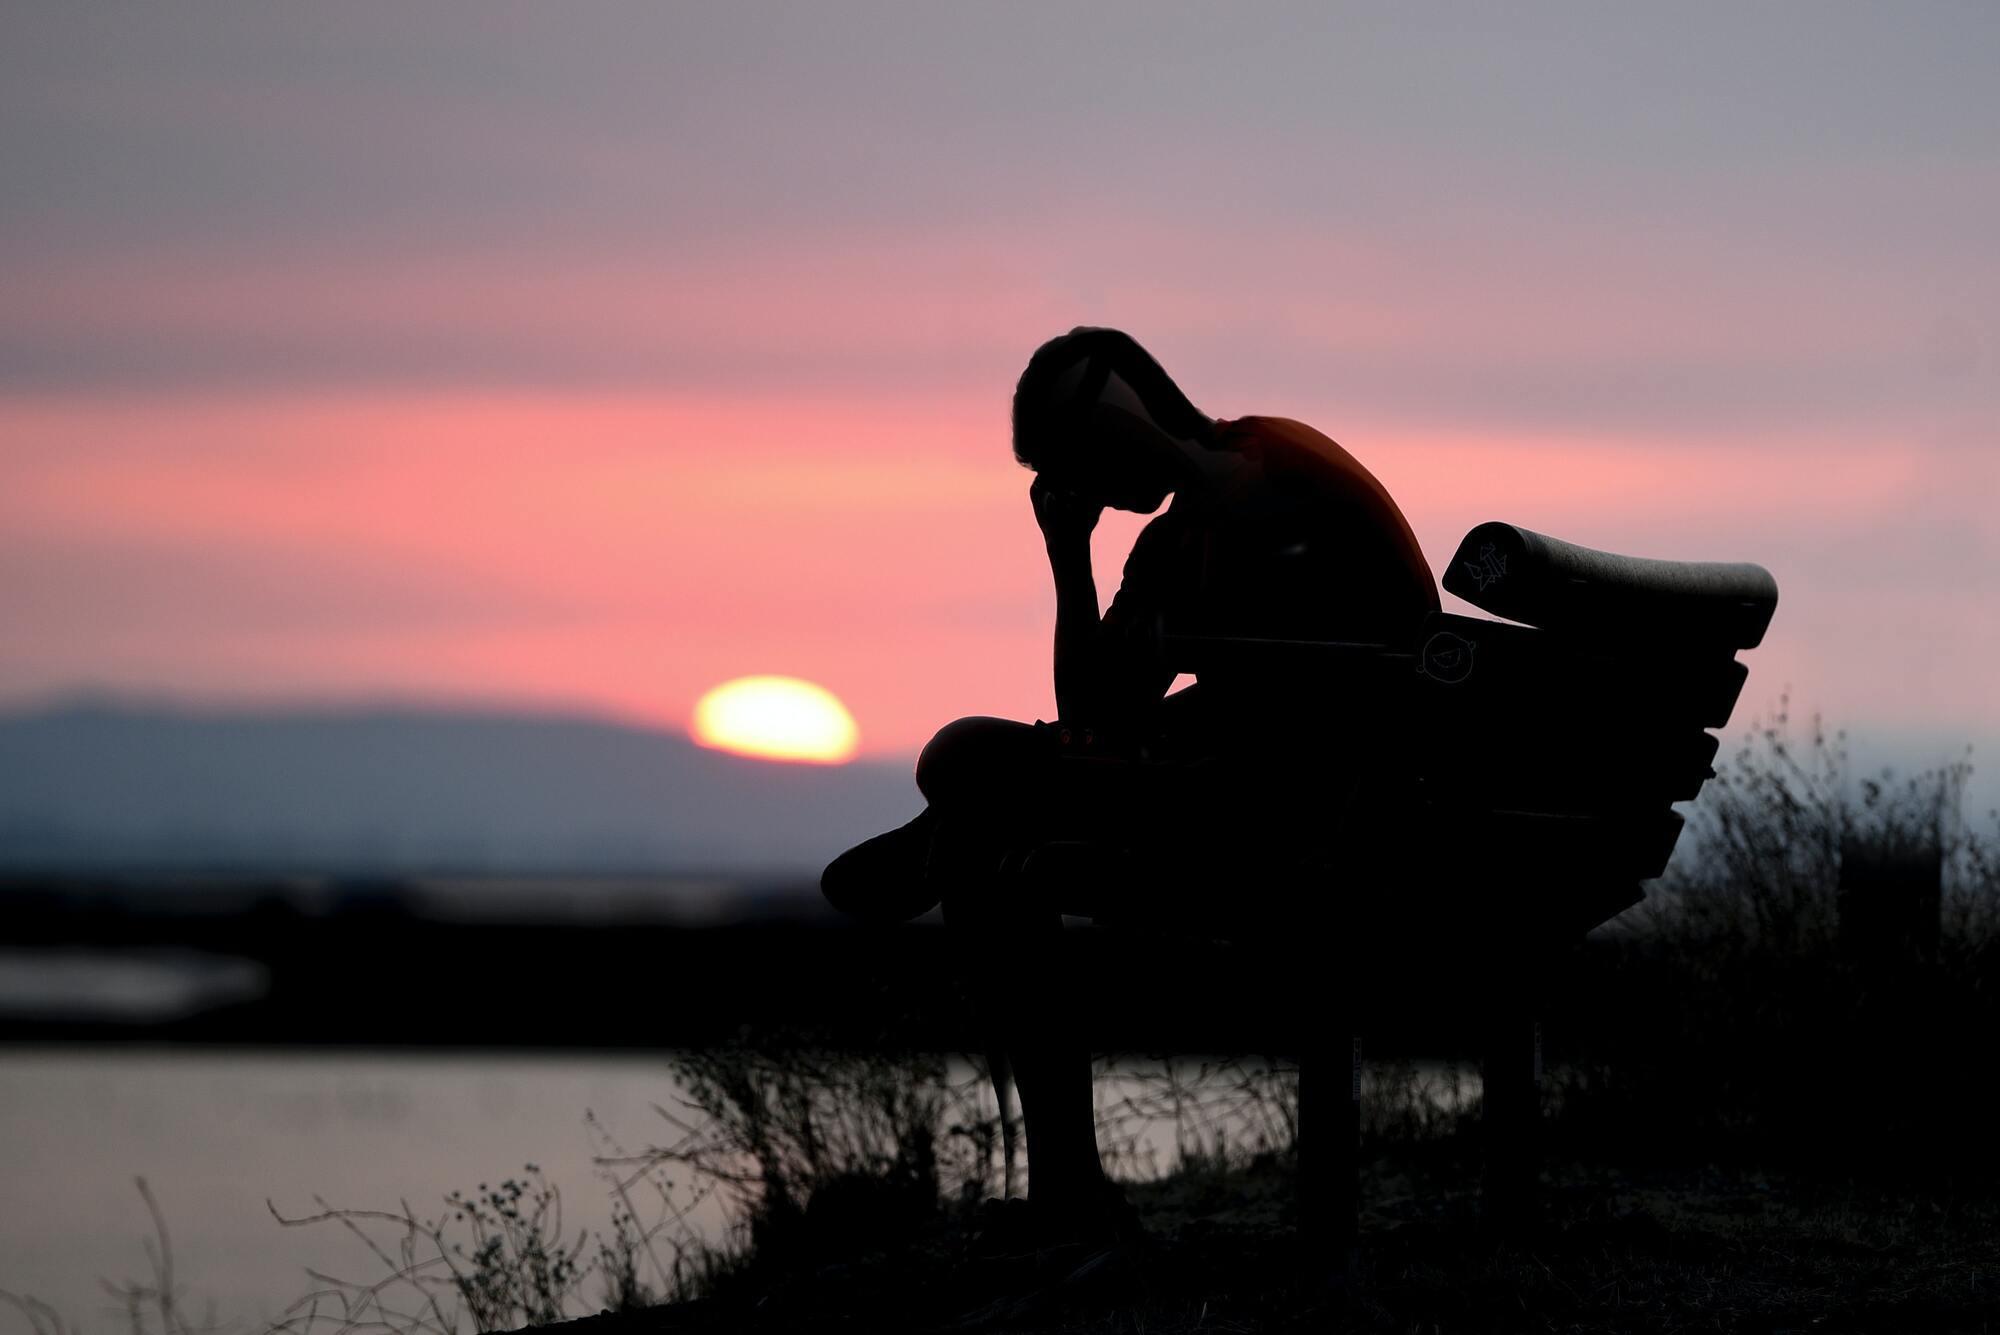 Распорядок дня крайне важен в борьбе с депрессией